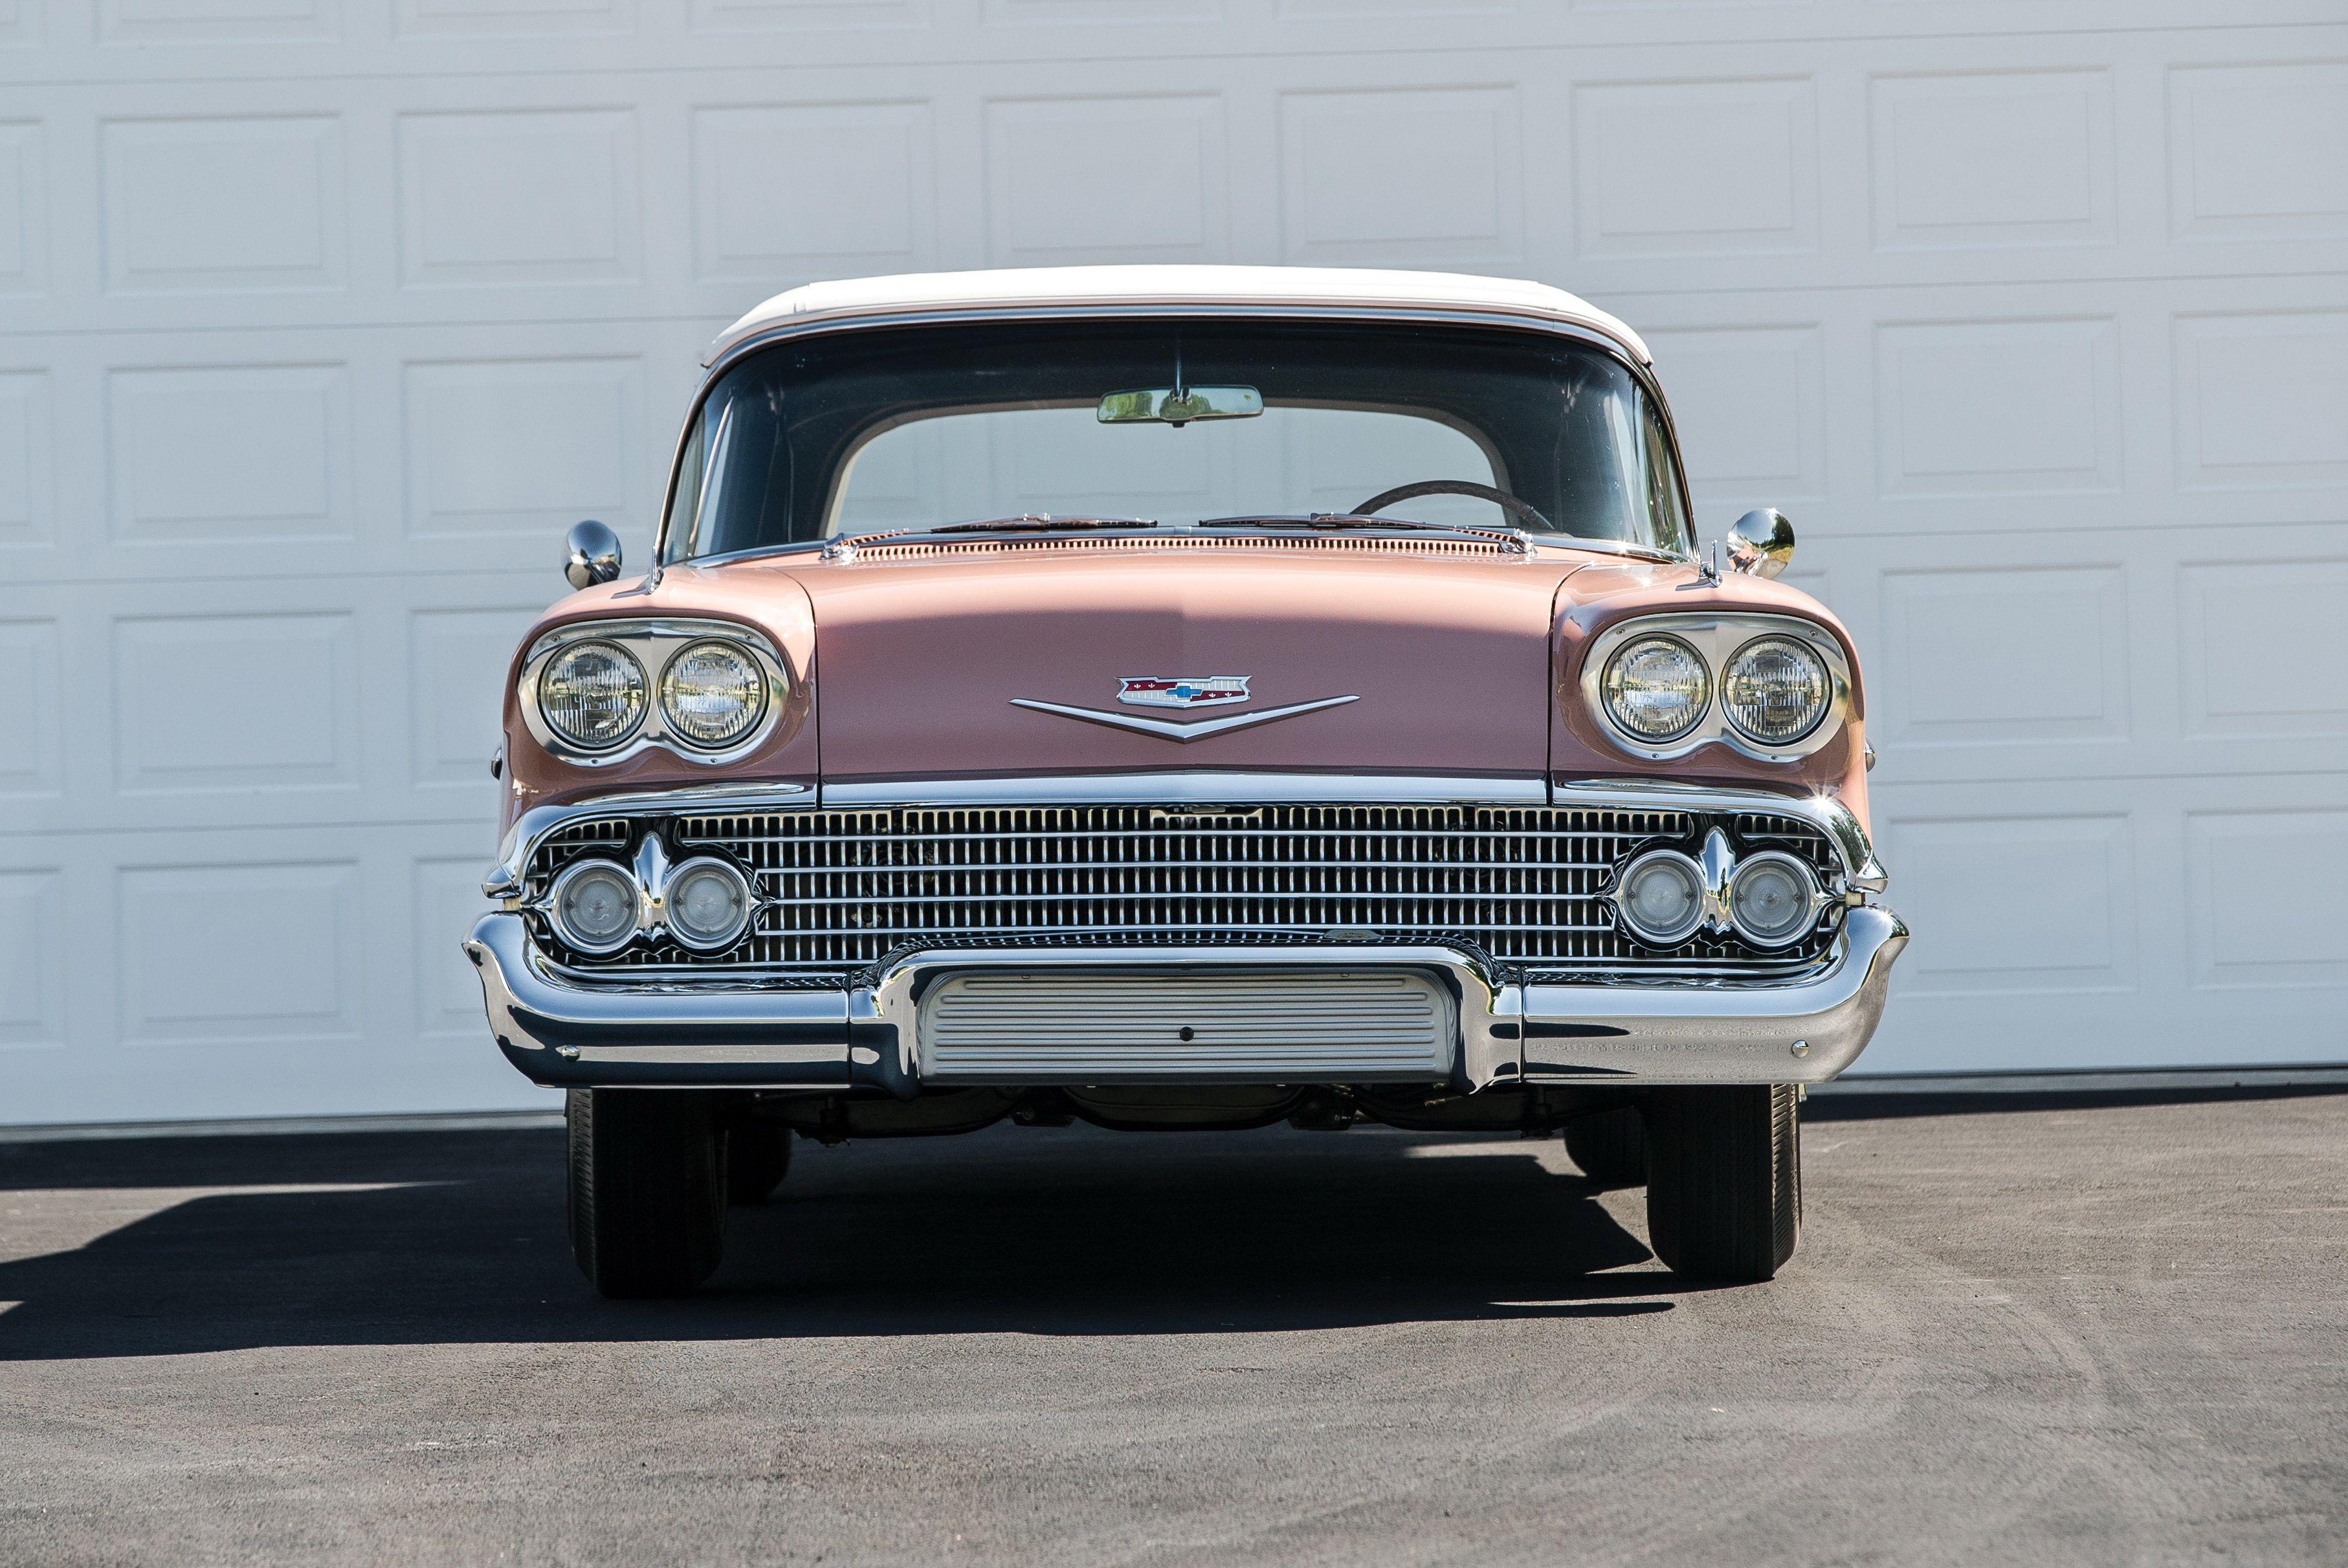 1958 Chevrolet Bel Air Impala 348 Super Turbo Thrust Tri Power